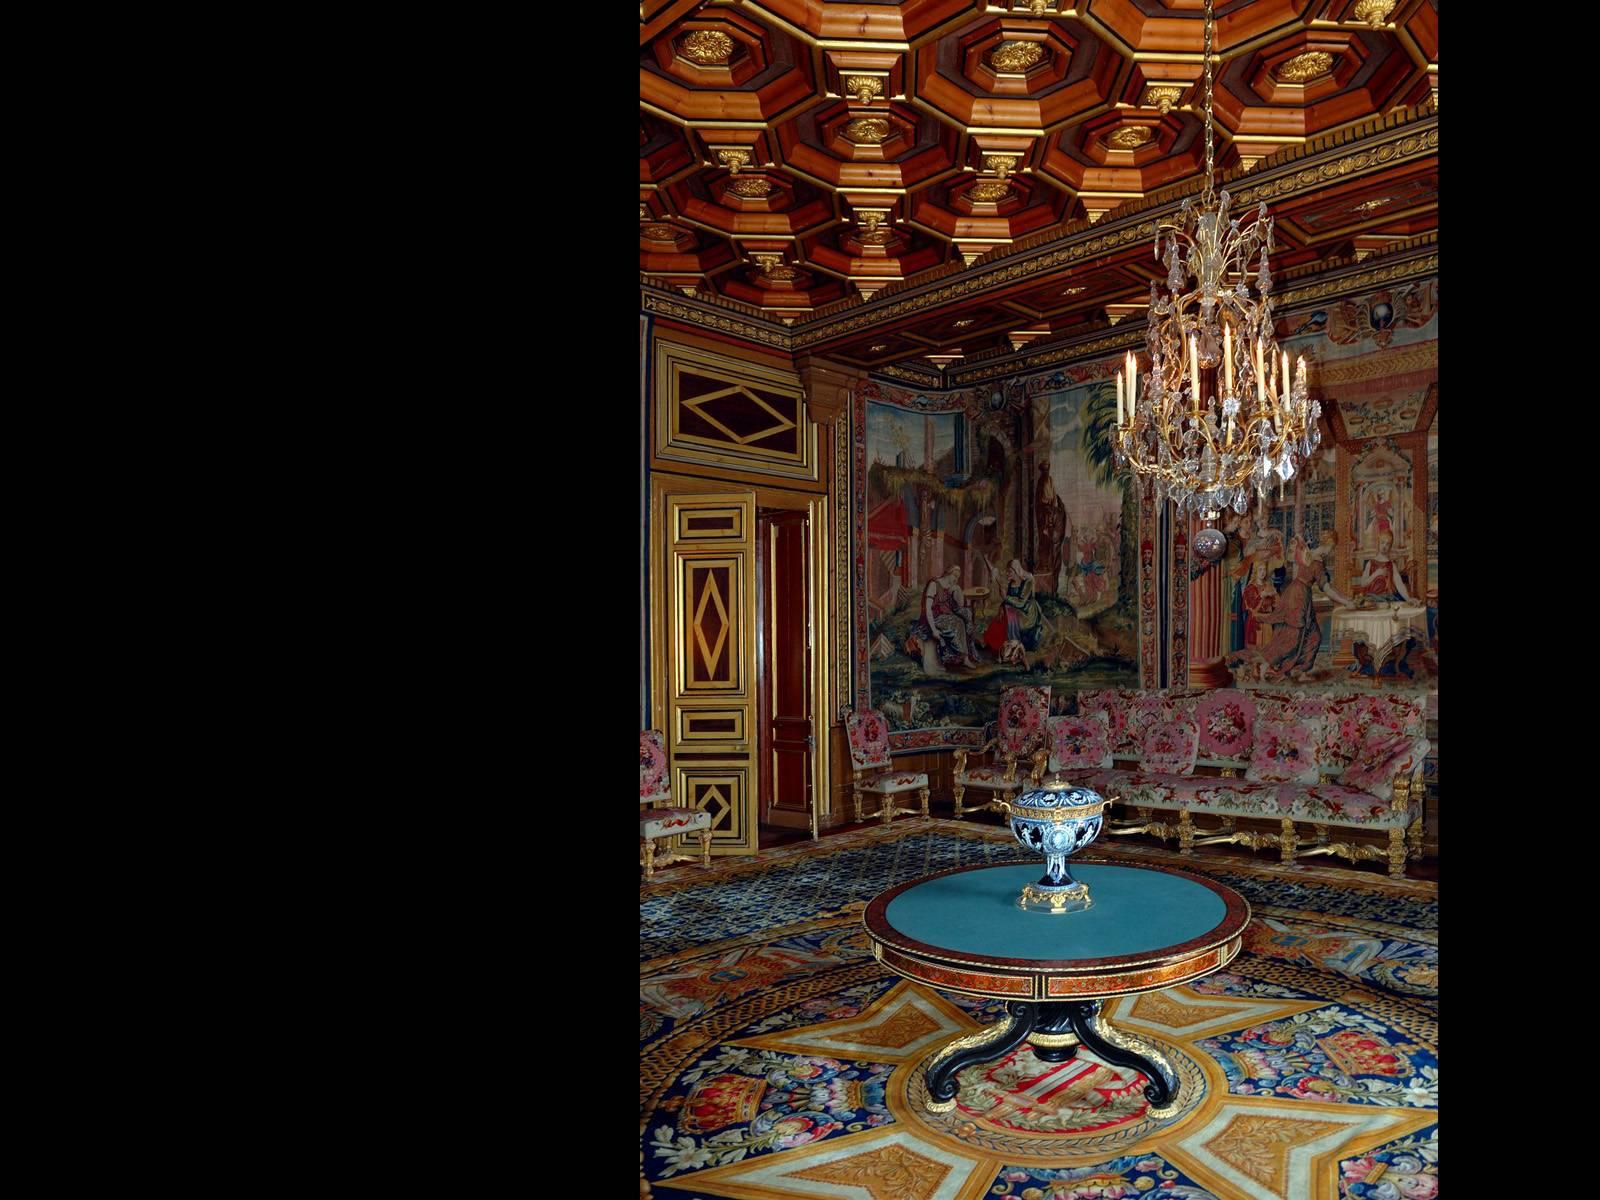 Interior Design 746.jpg